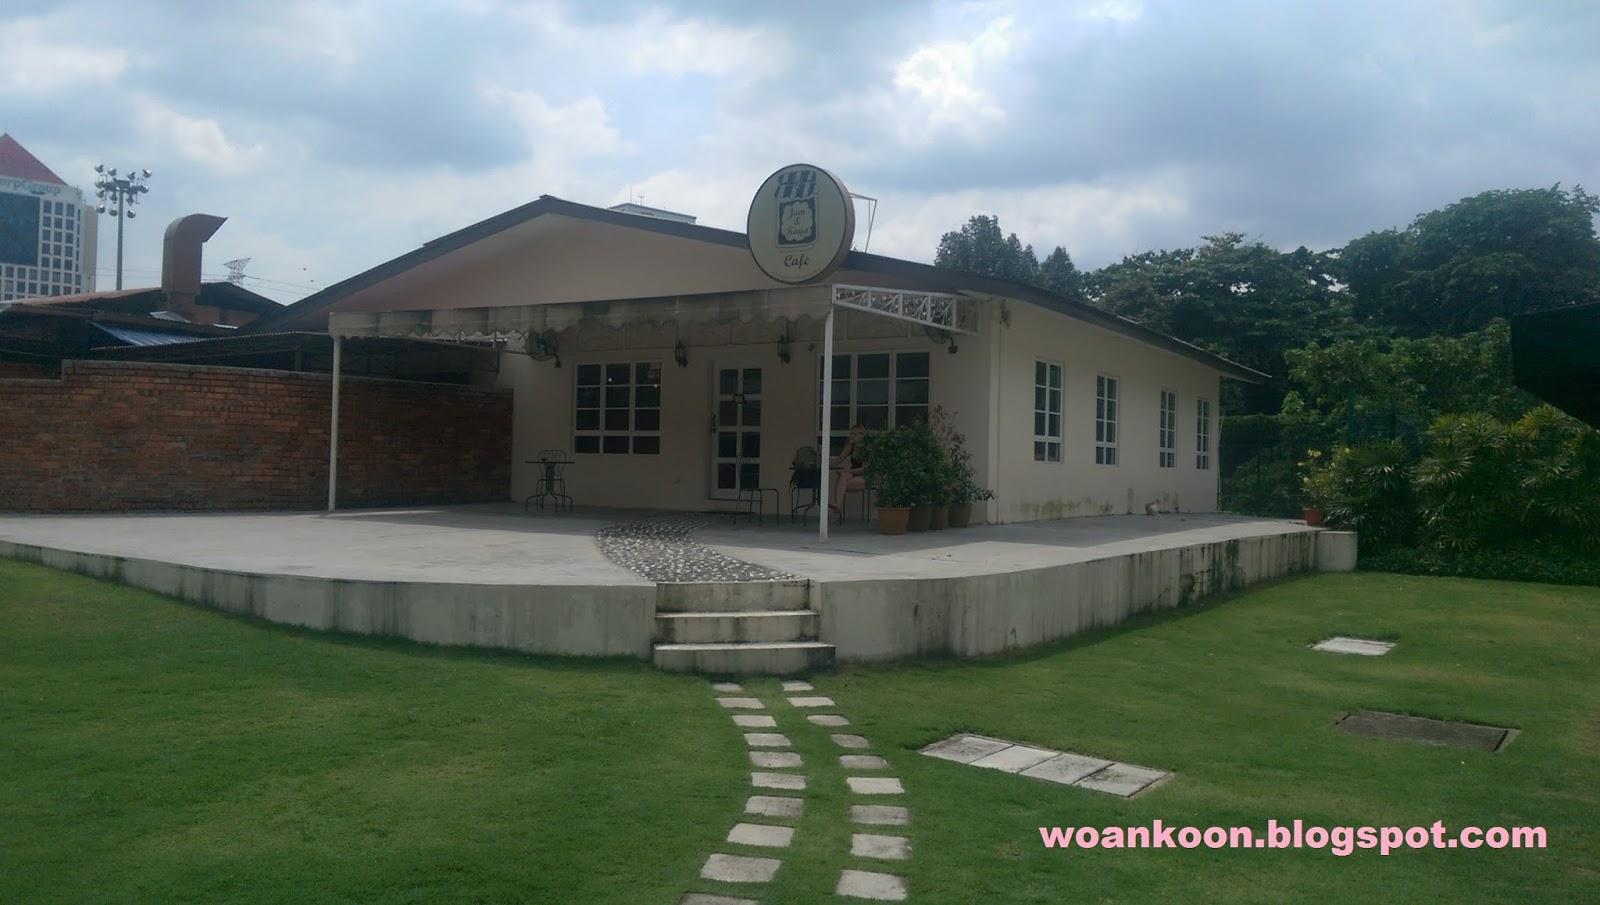 Jam Kaya Cafe Pj Palms Sports Centre Woan Koon Colourful Life